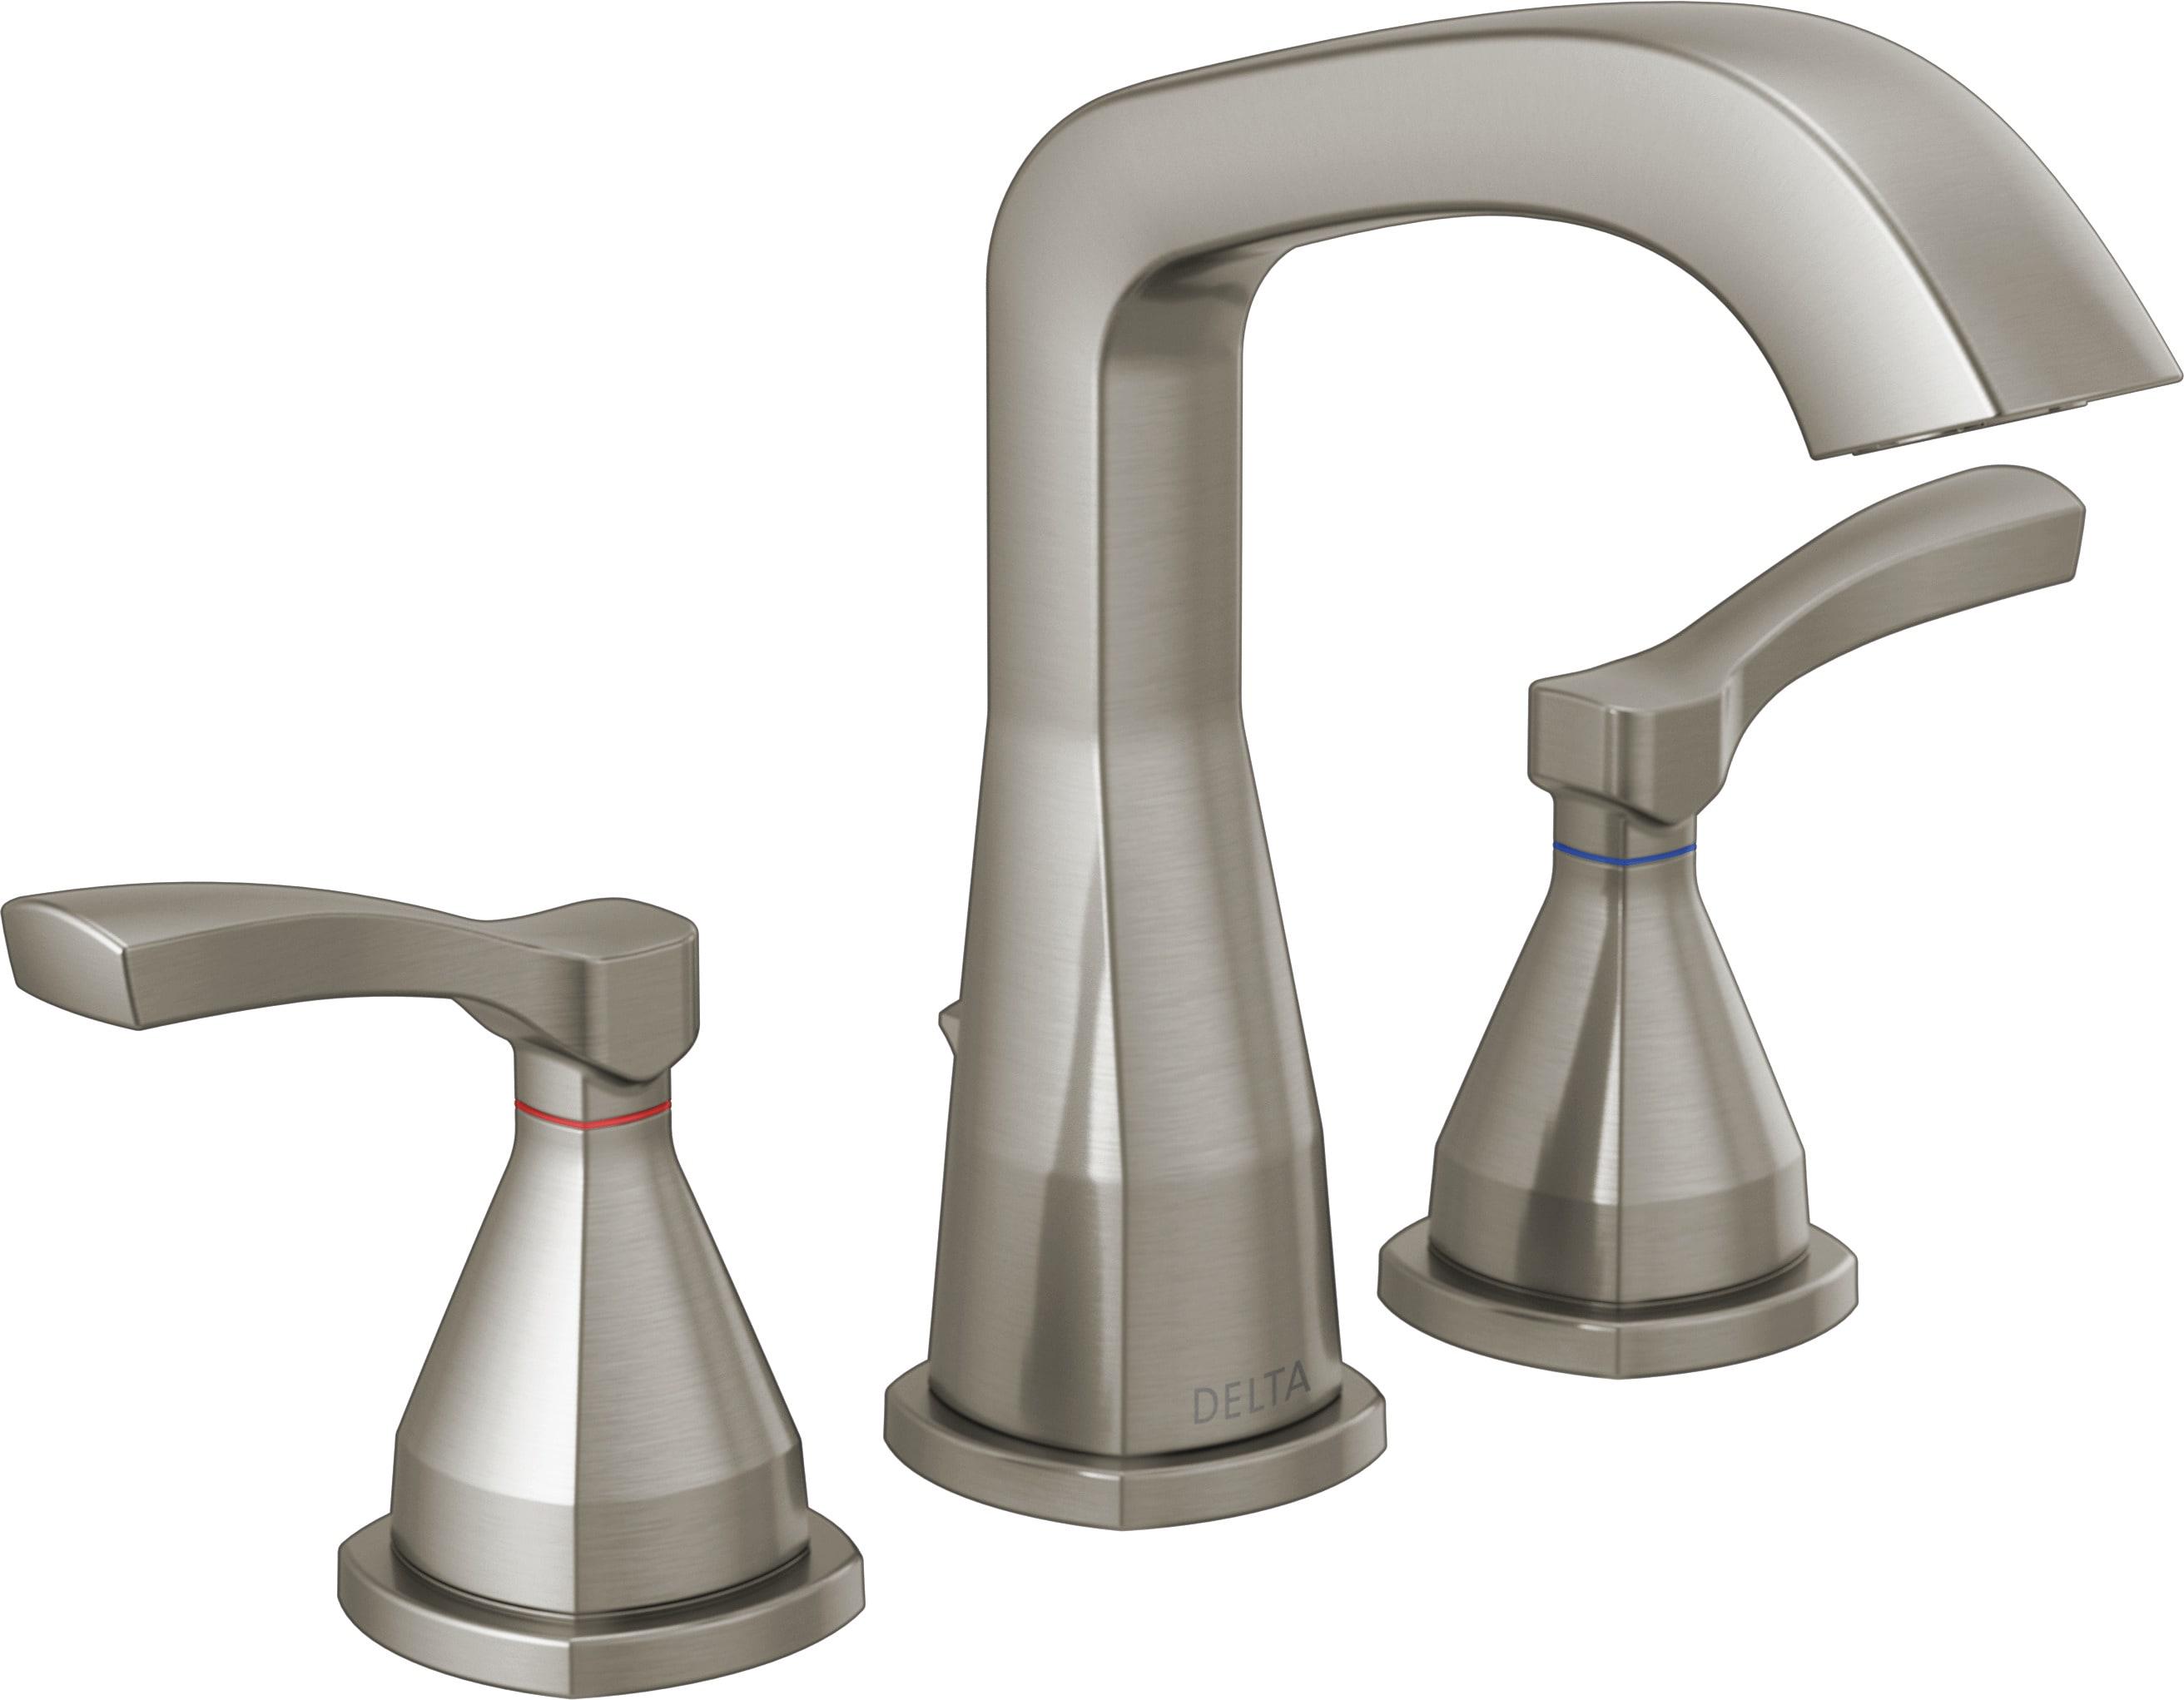 Delta Faucet 357766-CZMPU-DST Faucet Widespread Champagne Bronze